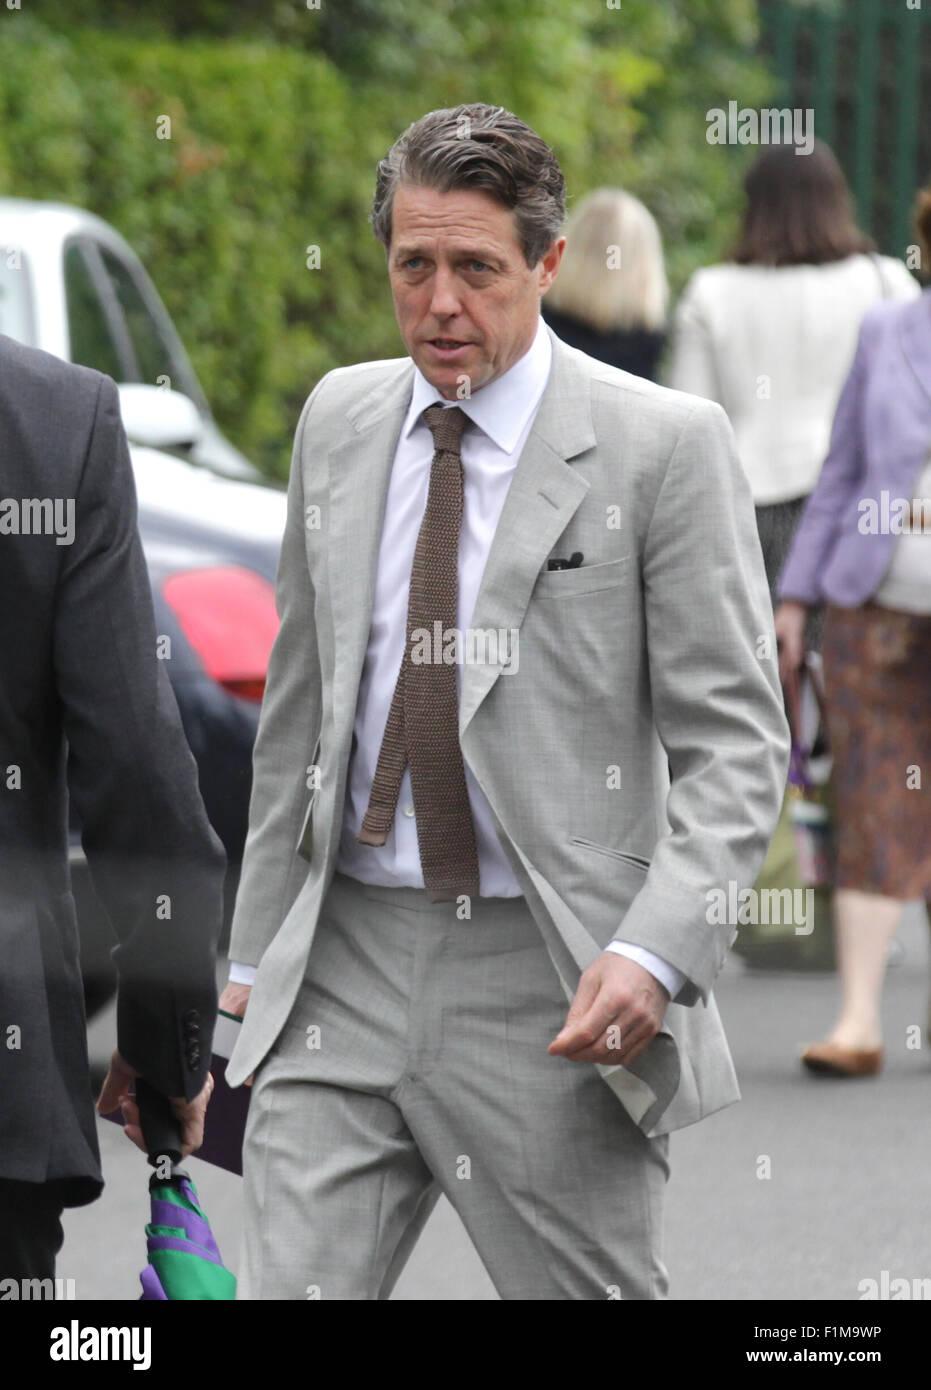 LONDON, UK, 12th July 2015: Hugh Grant seen at Wimbledon Championships 2015 - Stock Image